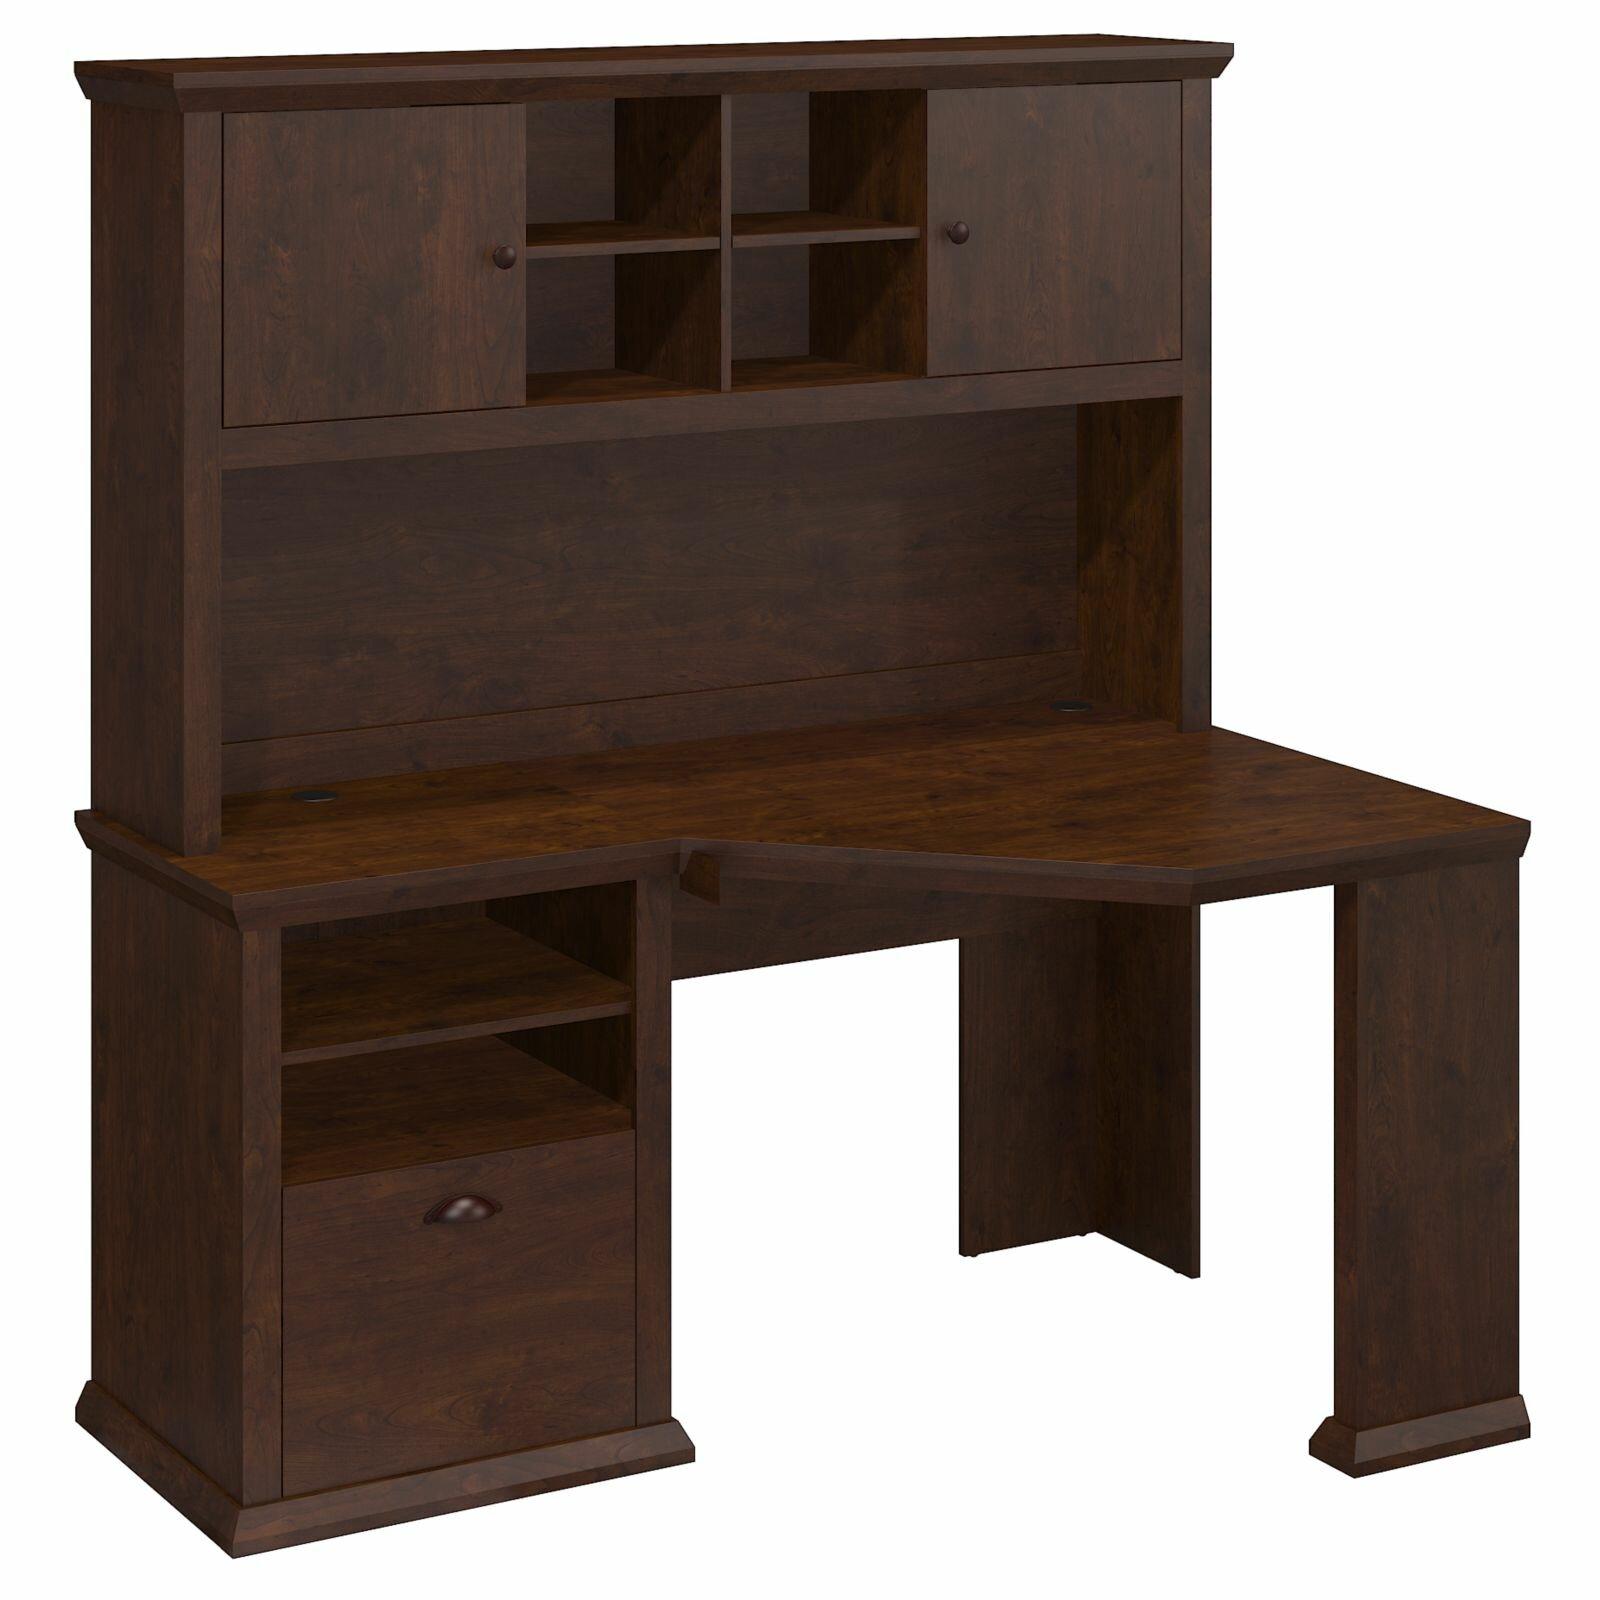 bush industries yorktown corner desk and hutch reviews wayfair. Black Bedroom Furniture Sets. Home Design Ideas